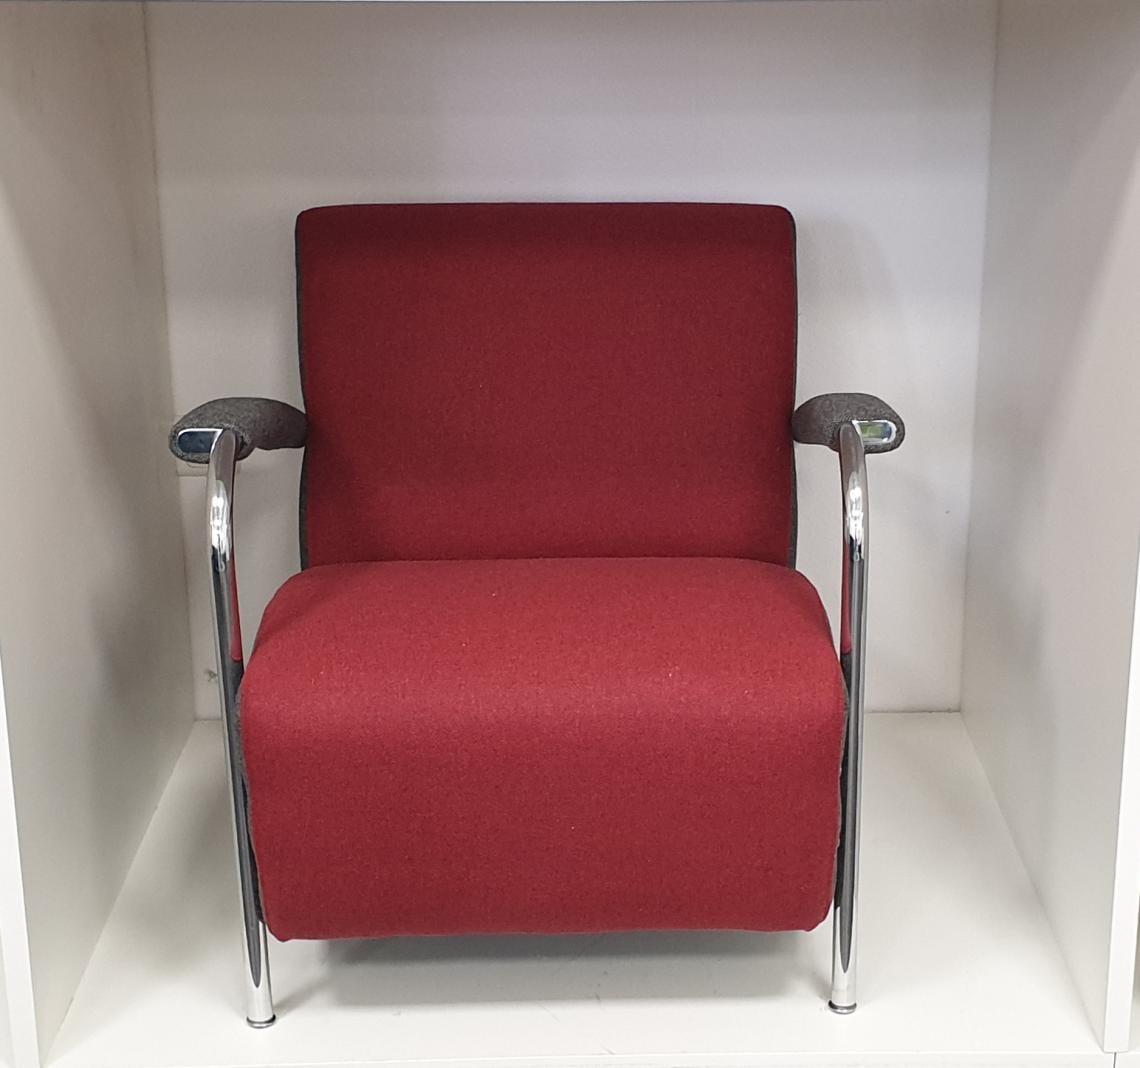 Leolux Scylla fauteuil  - Refurbished